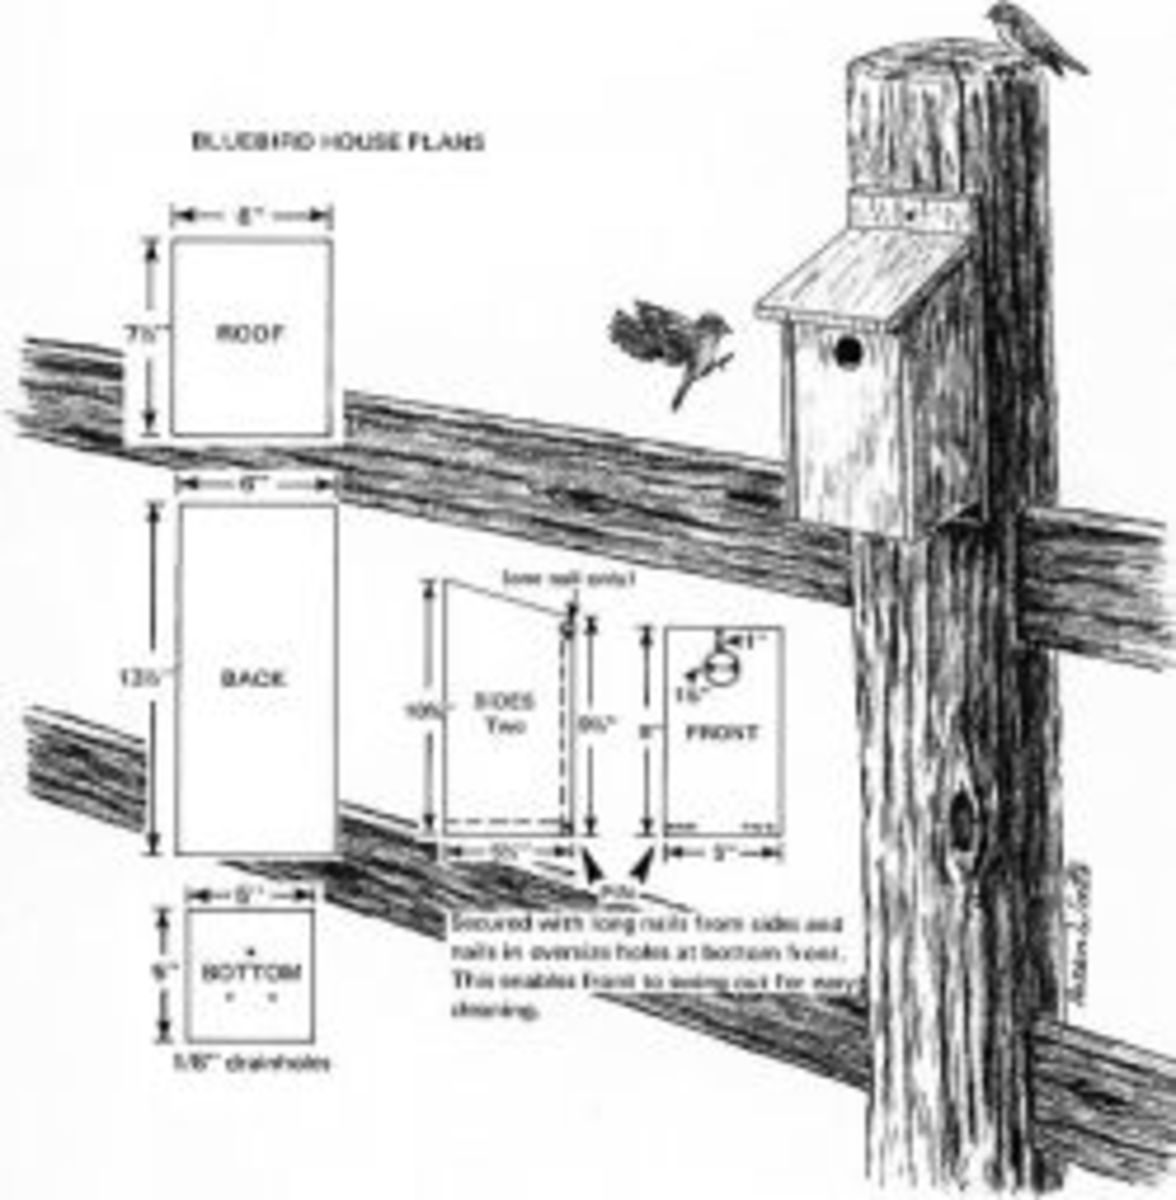 How to Build a Bluebird House